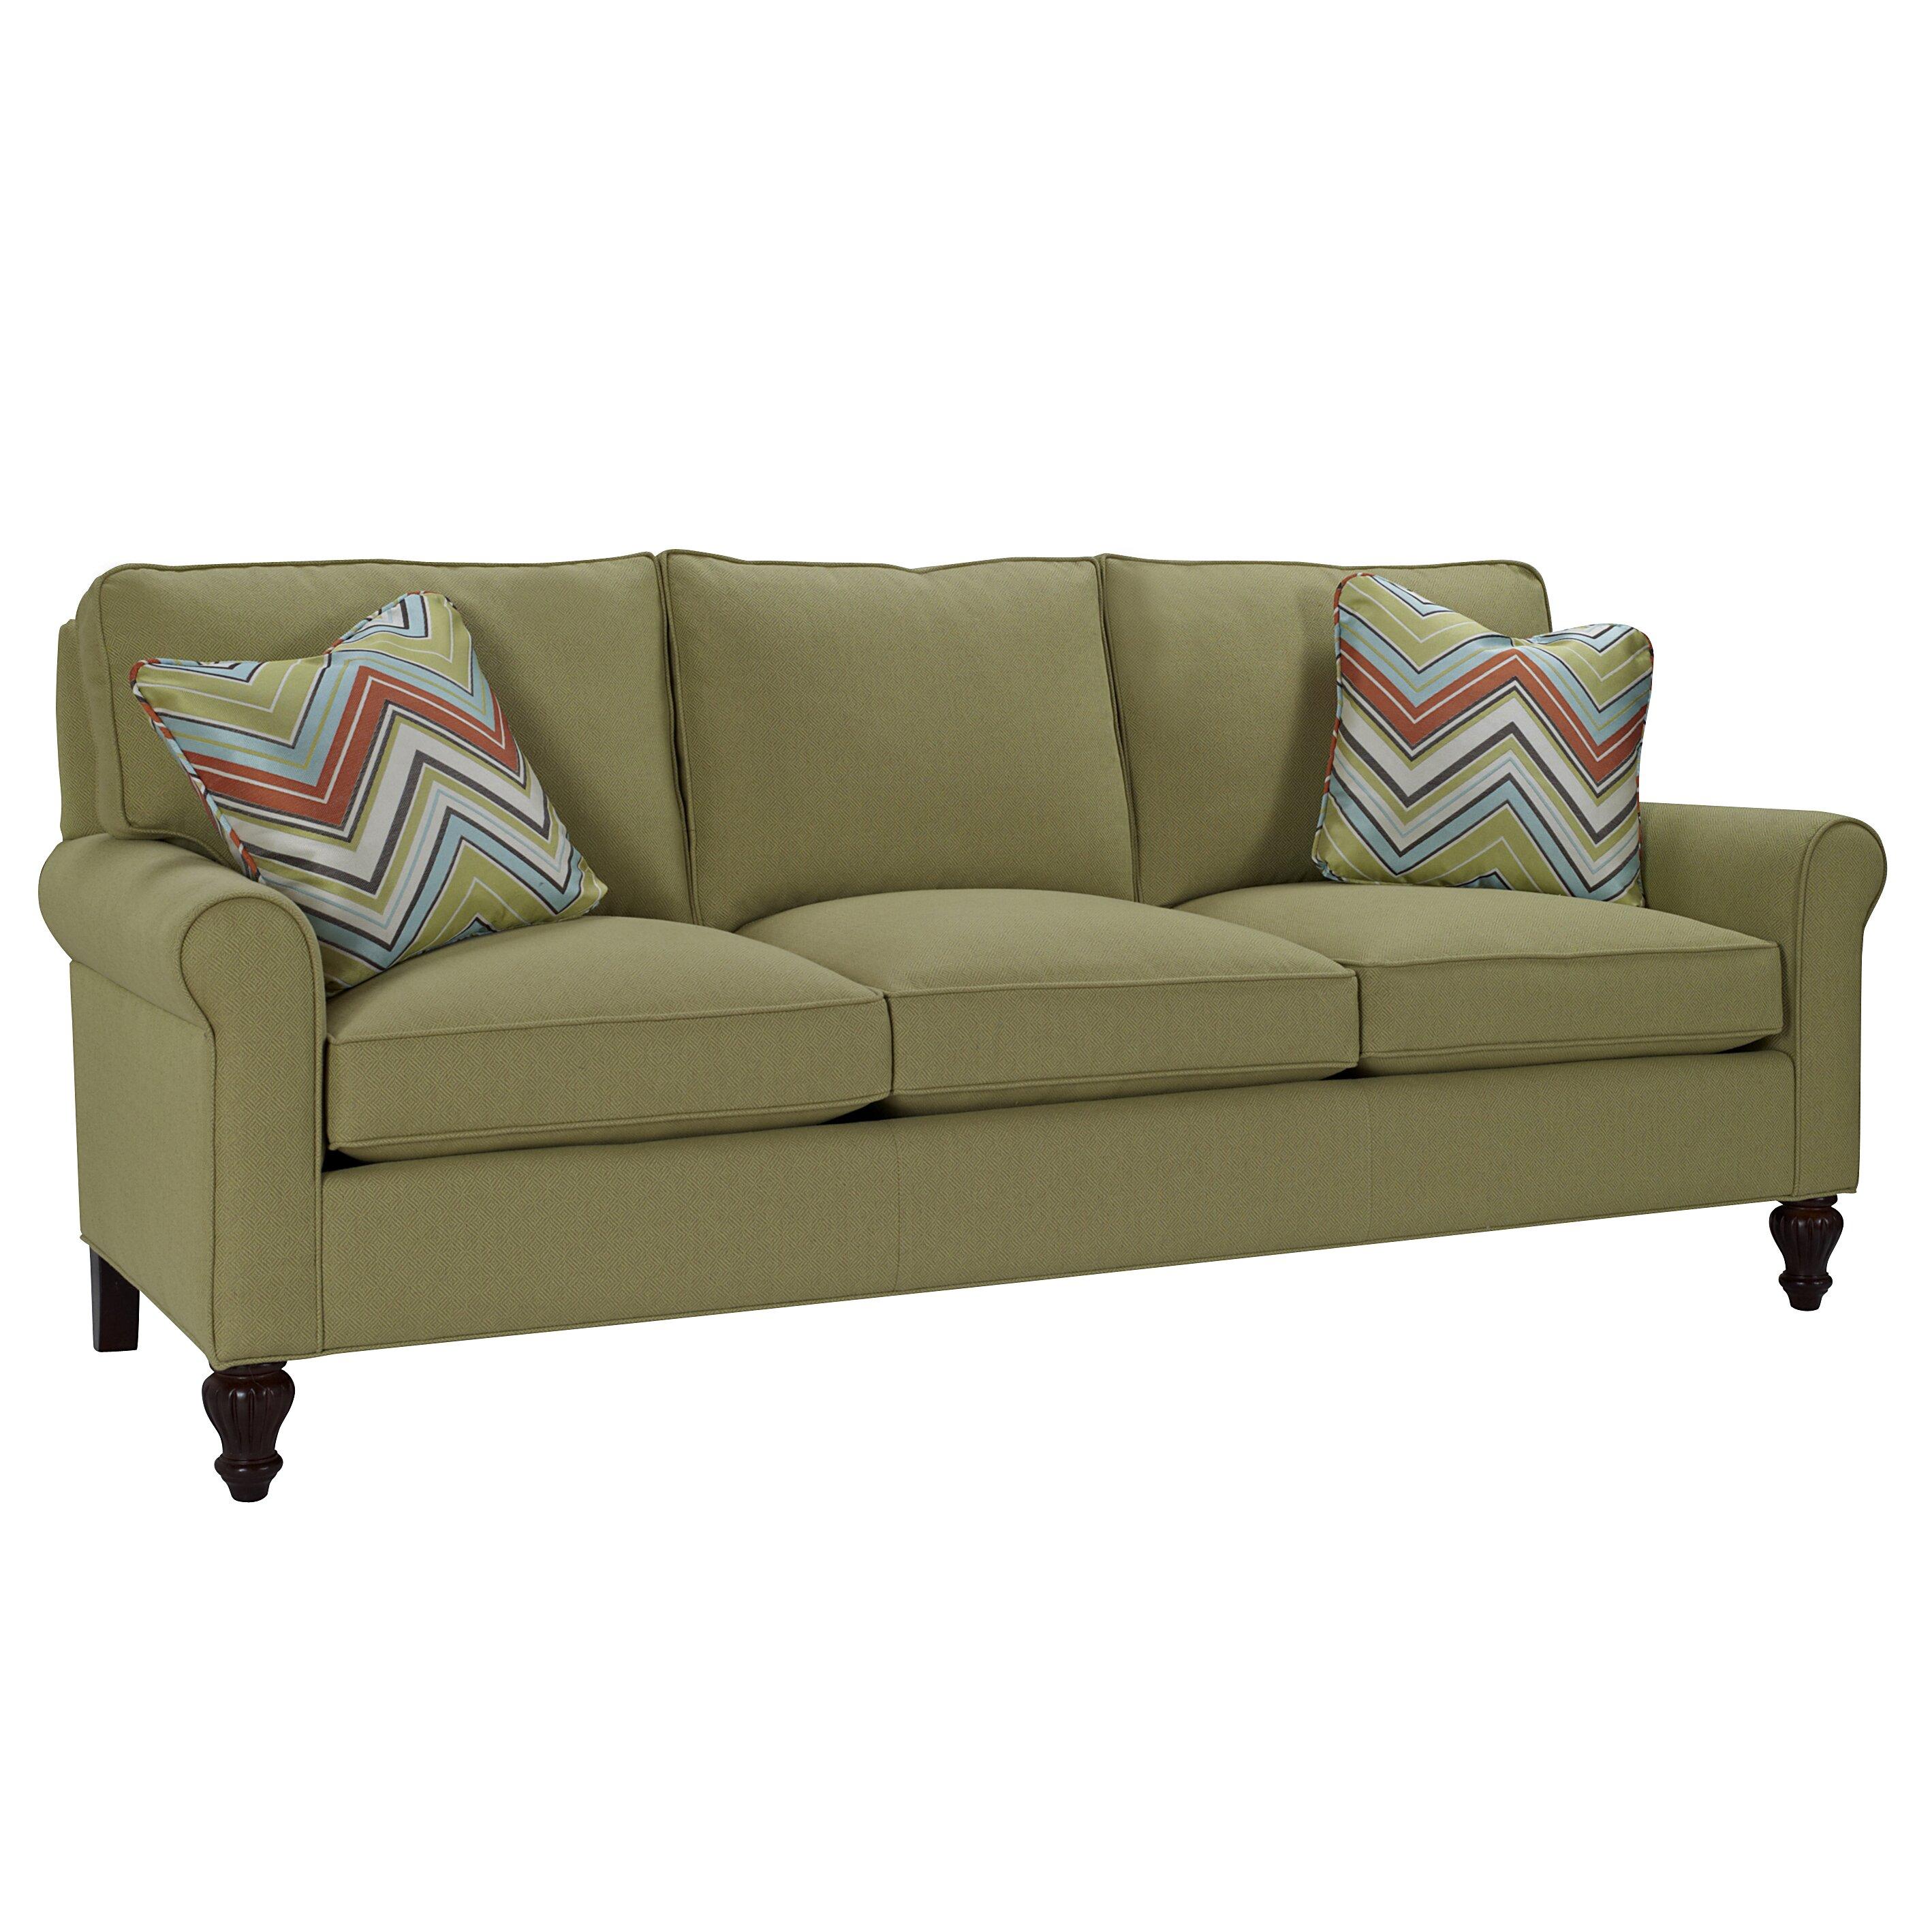 Classic Comfort Curved Arm Three Loose Pillow Back Sofa Wayfair